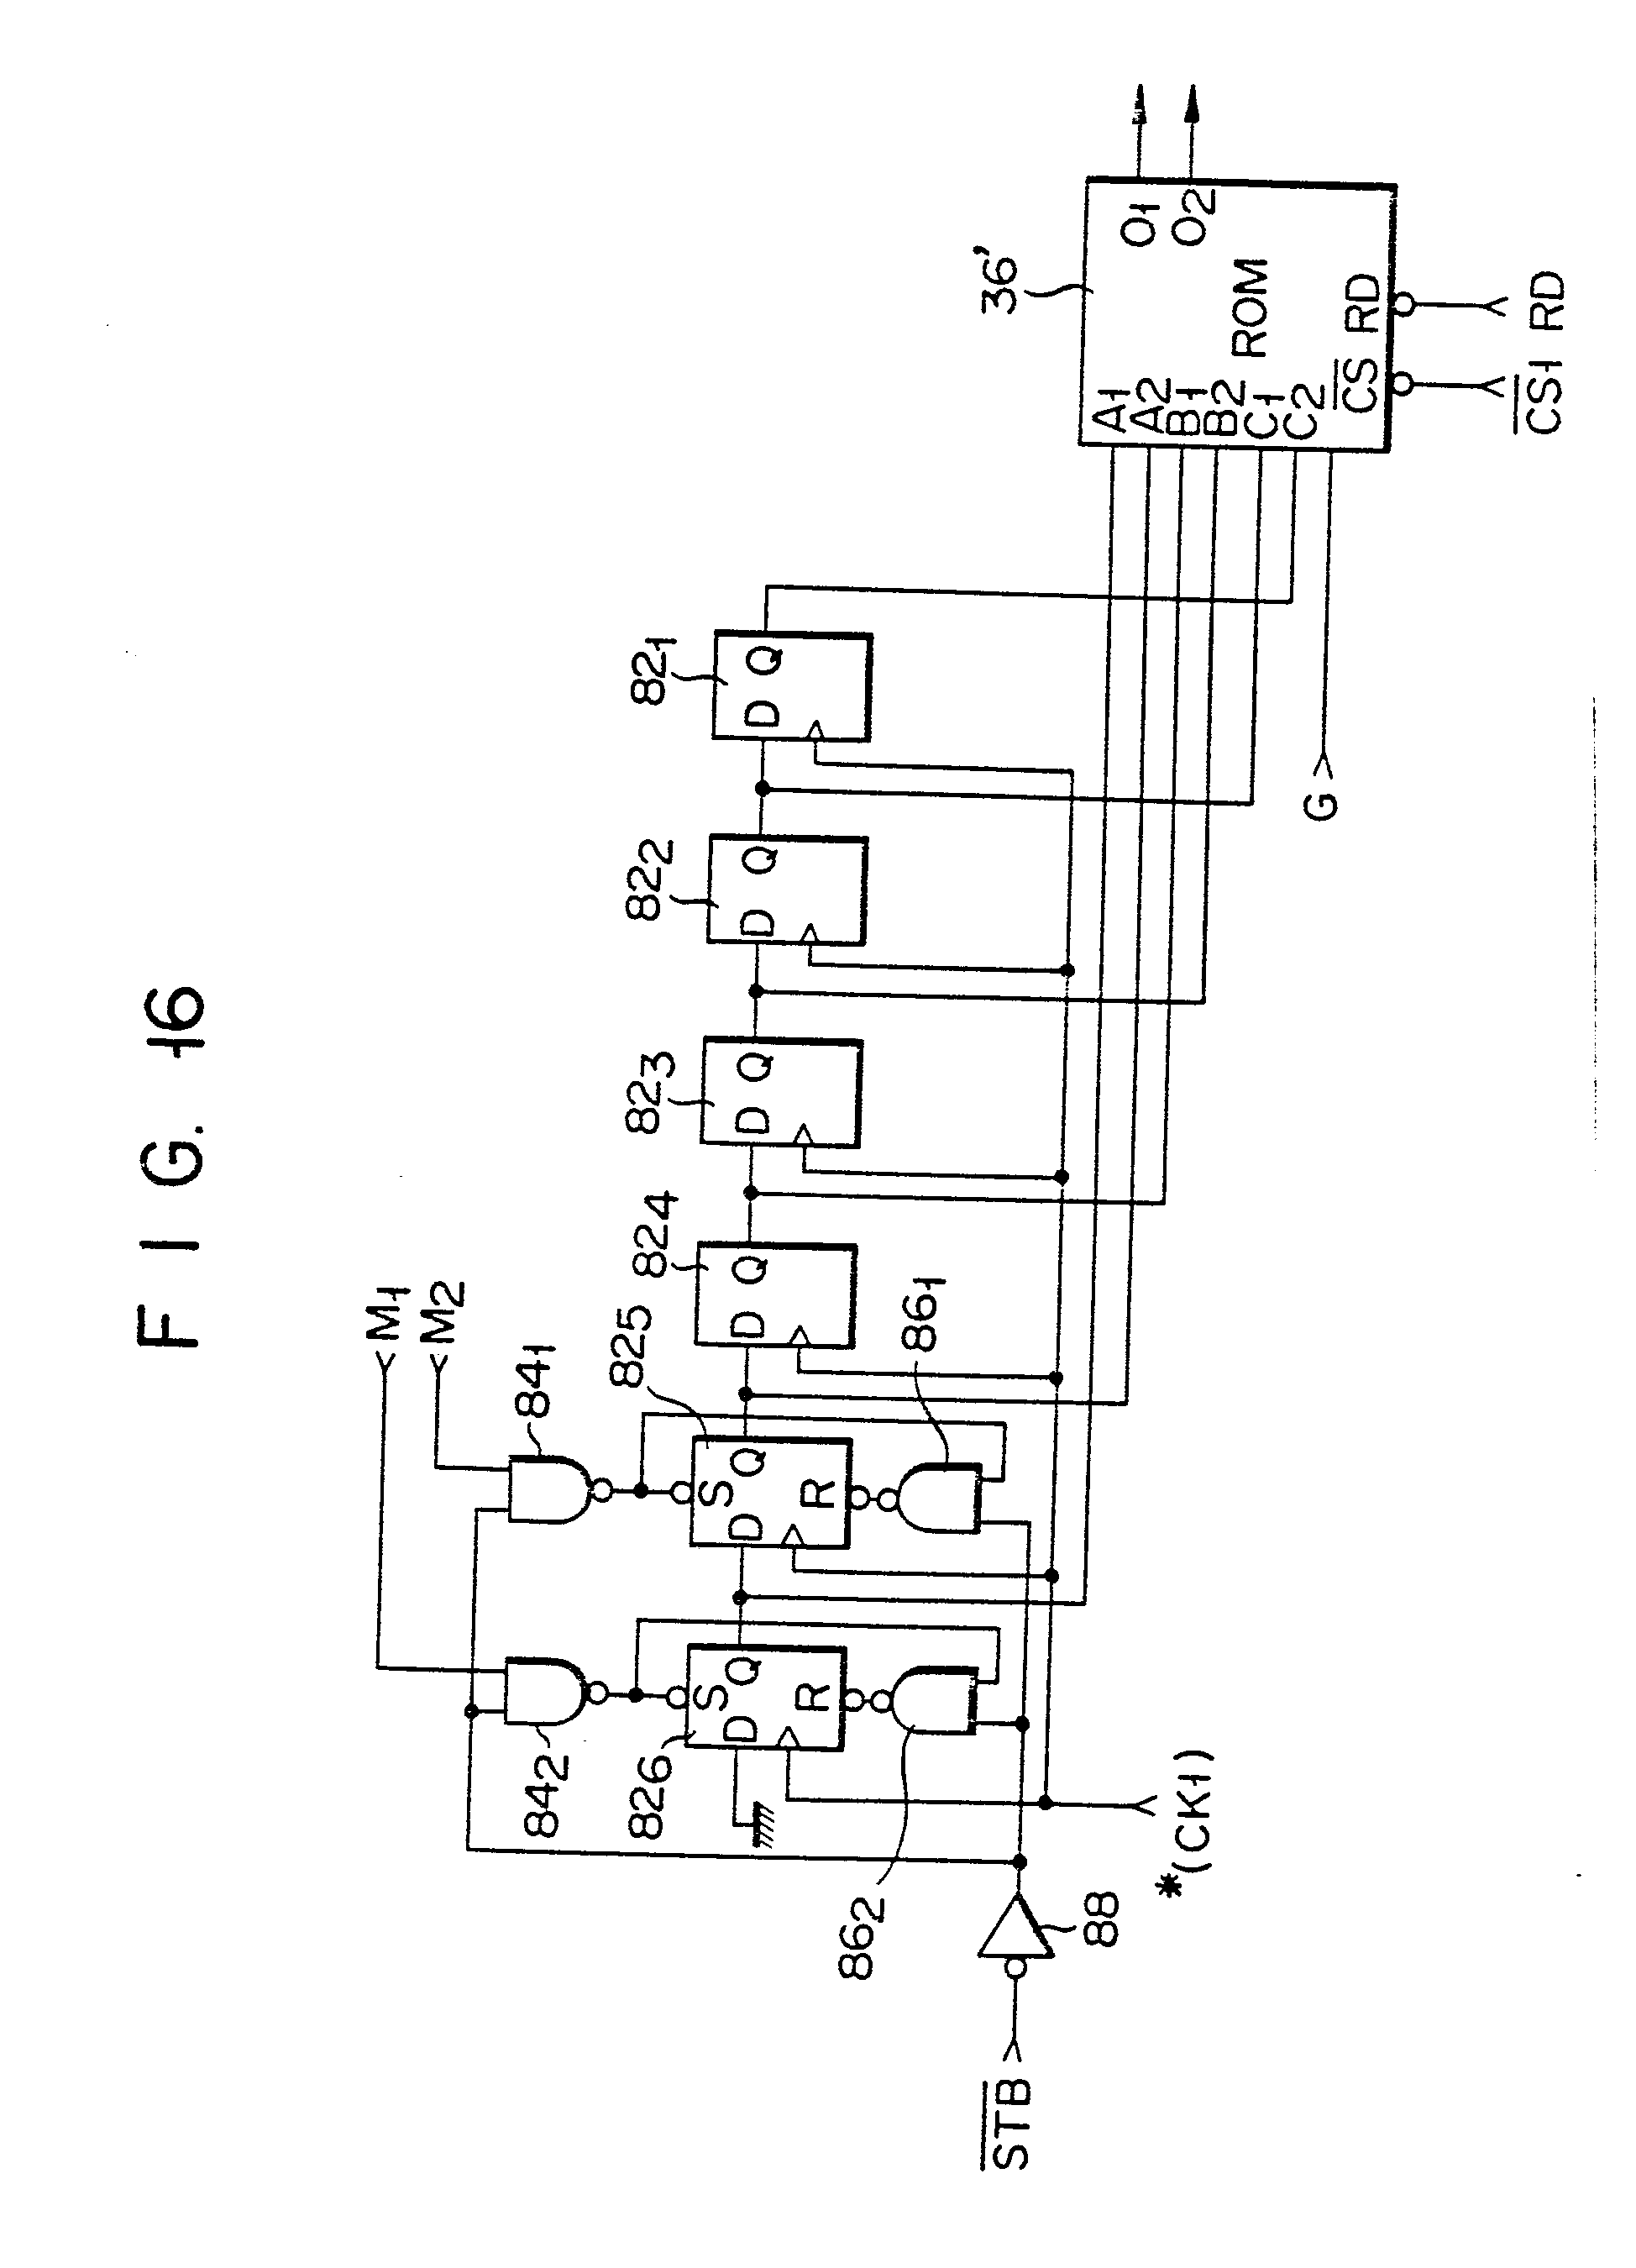 Stihl Fs 55 Parts Diagram